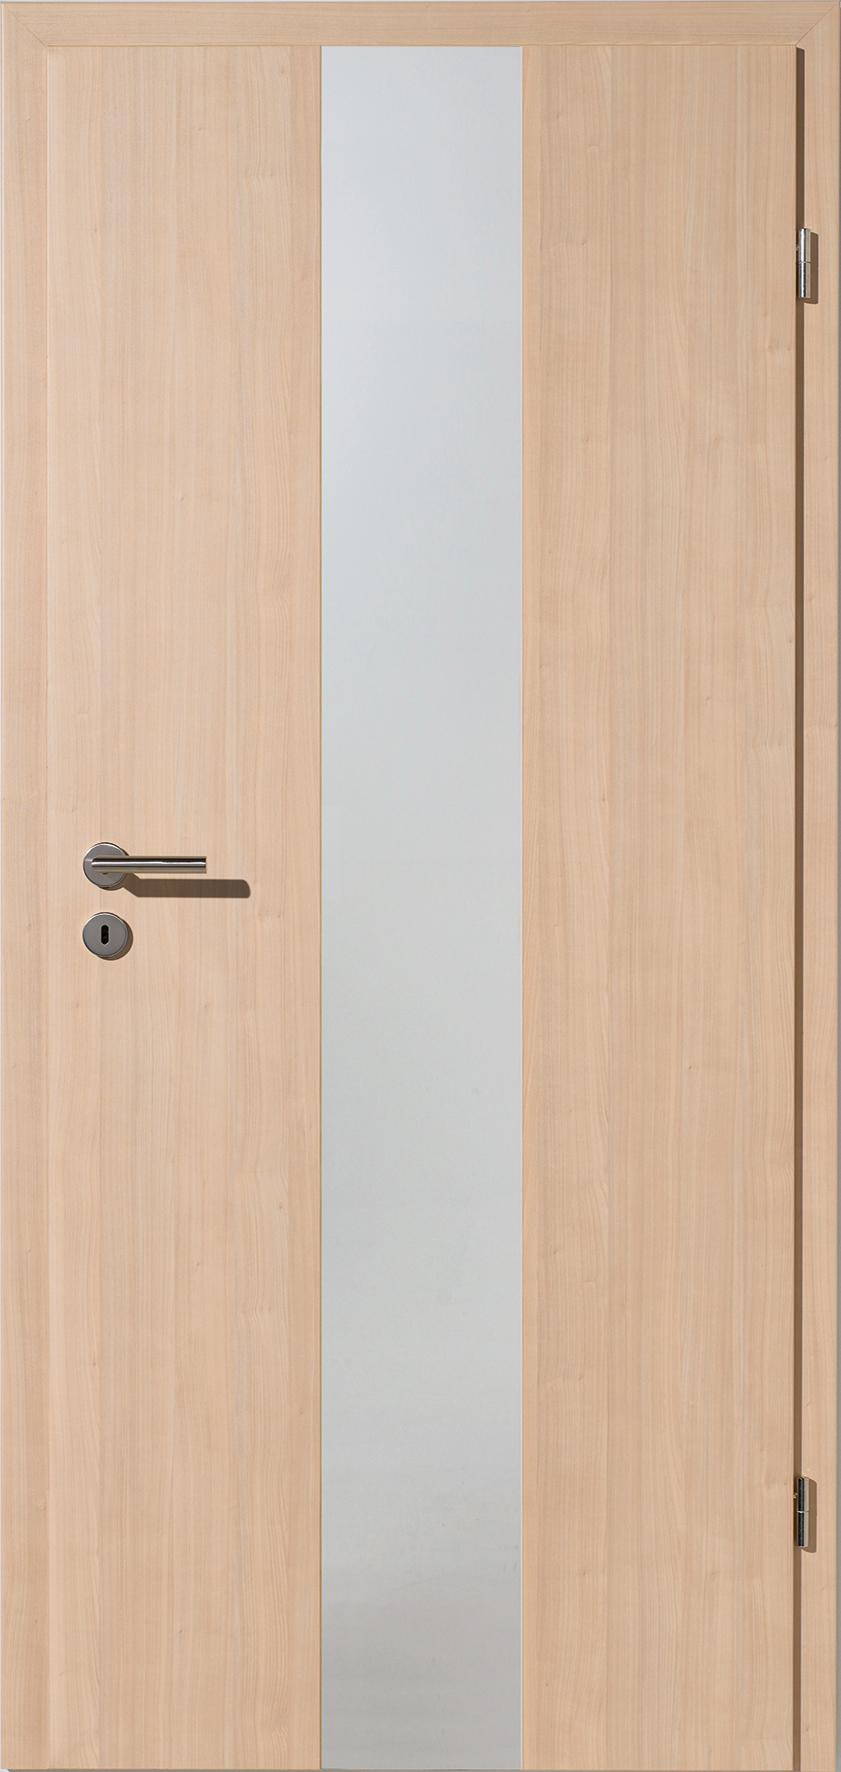 modernes t relement vision mittig decora sandbirke von herholz. Black Bedroom Furniture Sets. Home Design Ideas